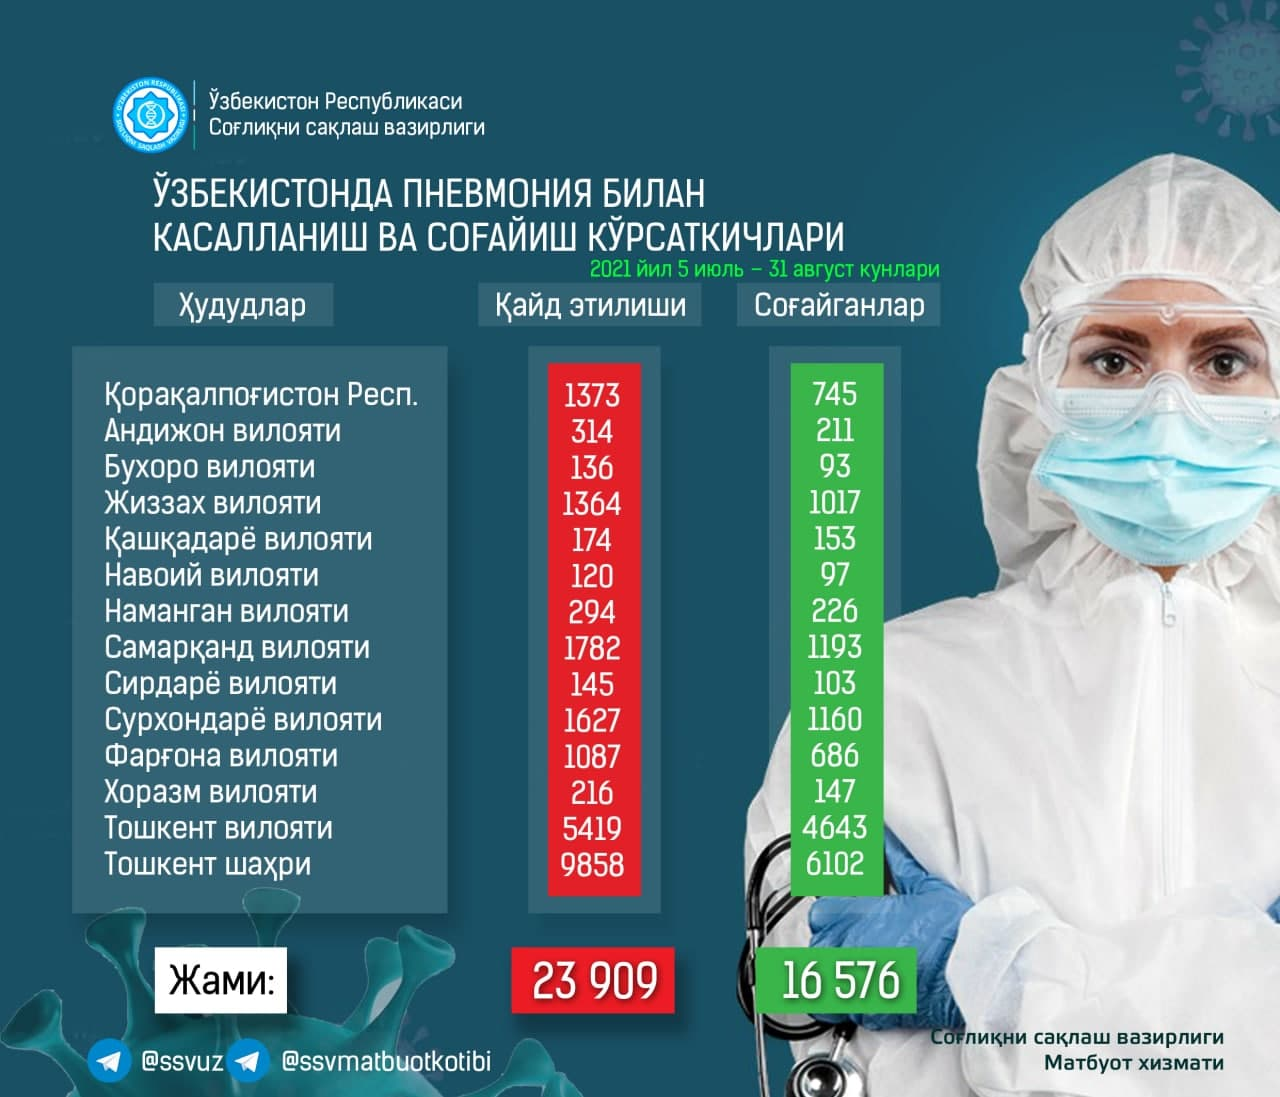 За сутки более 240 человек заболело пневмонией — статистика